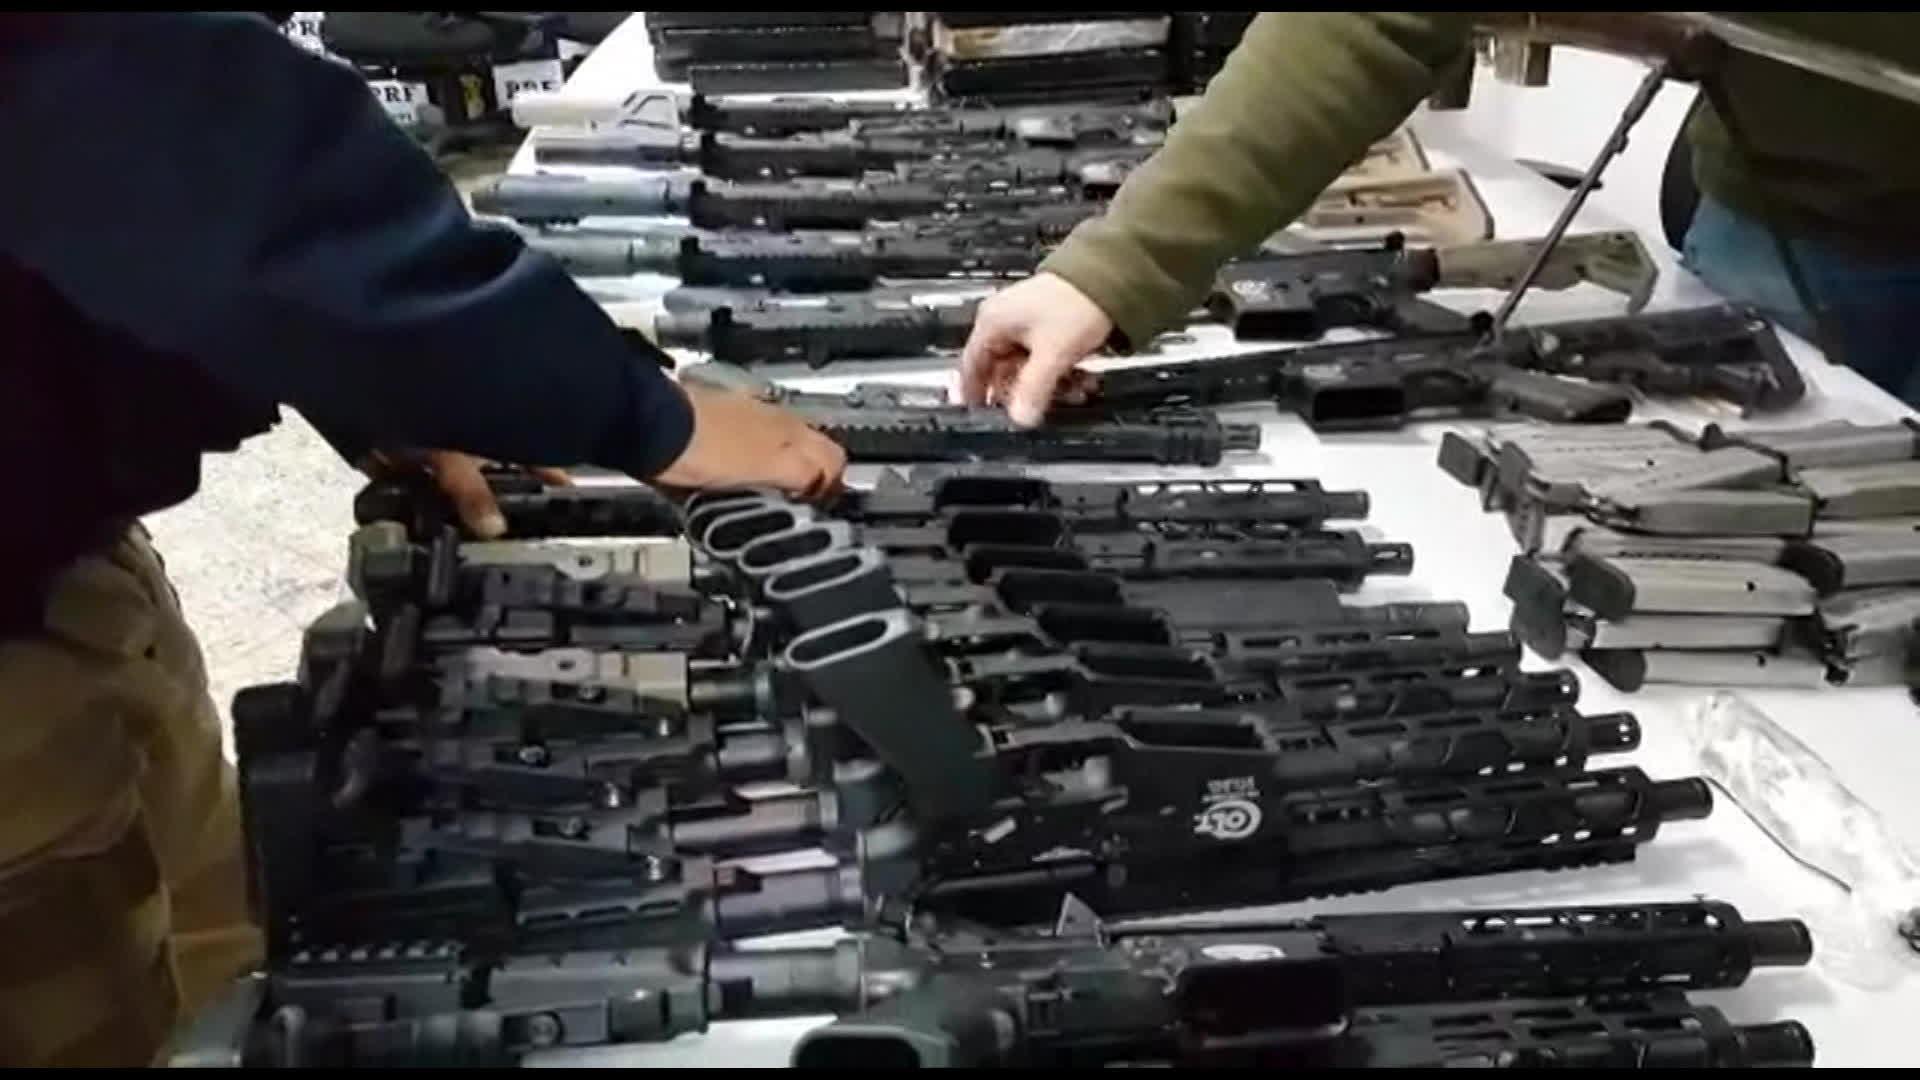 PRF apreende carregamento de fuzil que estava sendo levado para o Complexo da Maré, Zona Norte do Rio